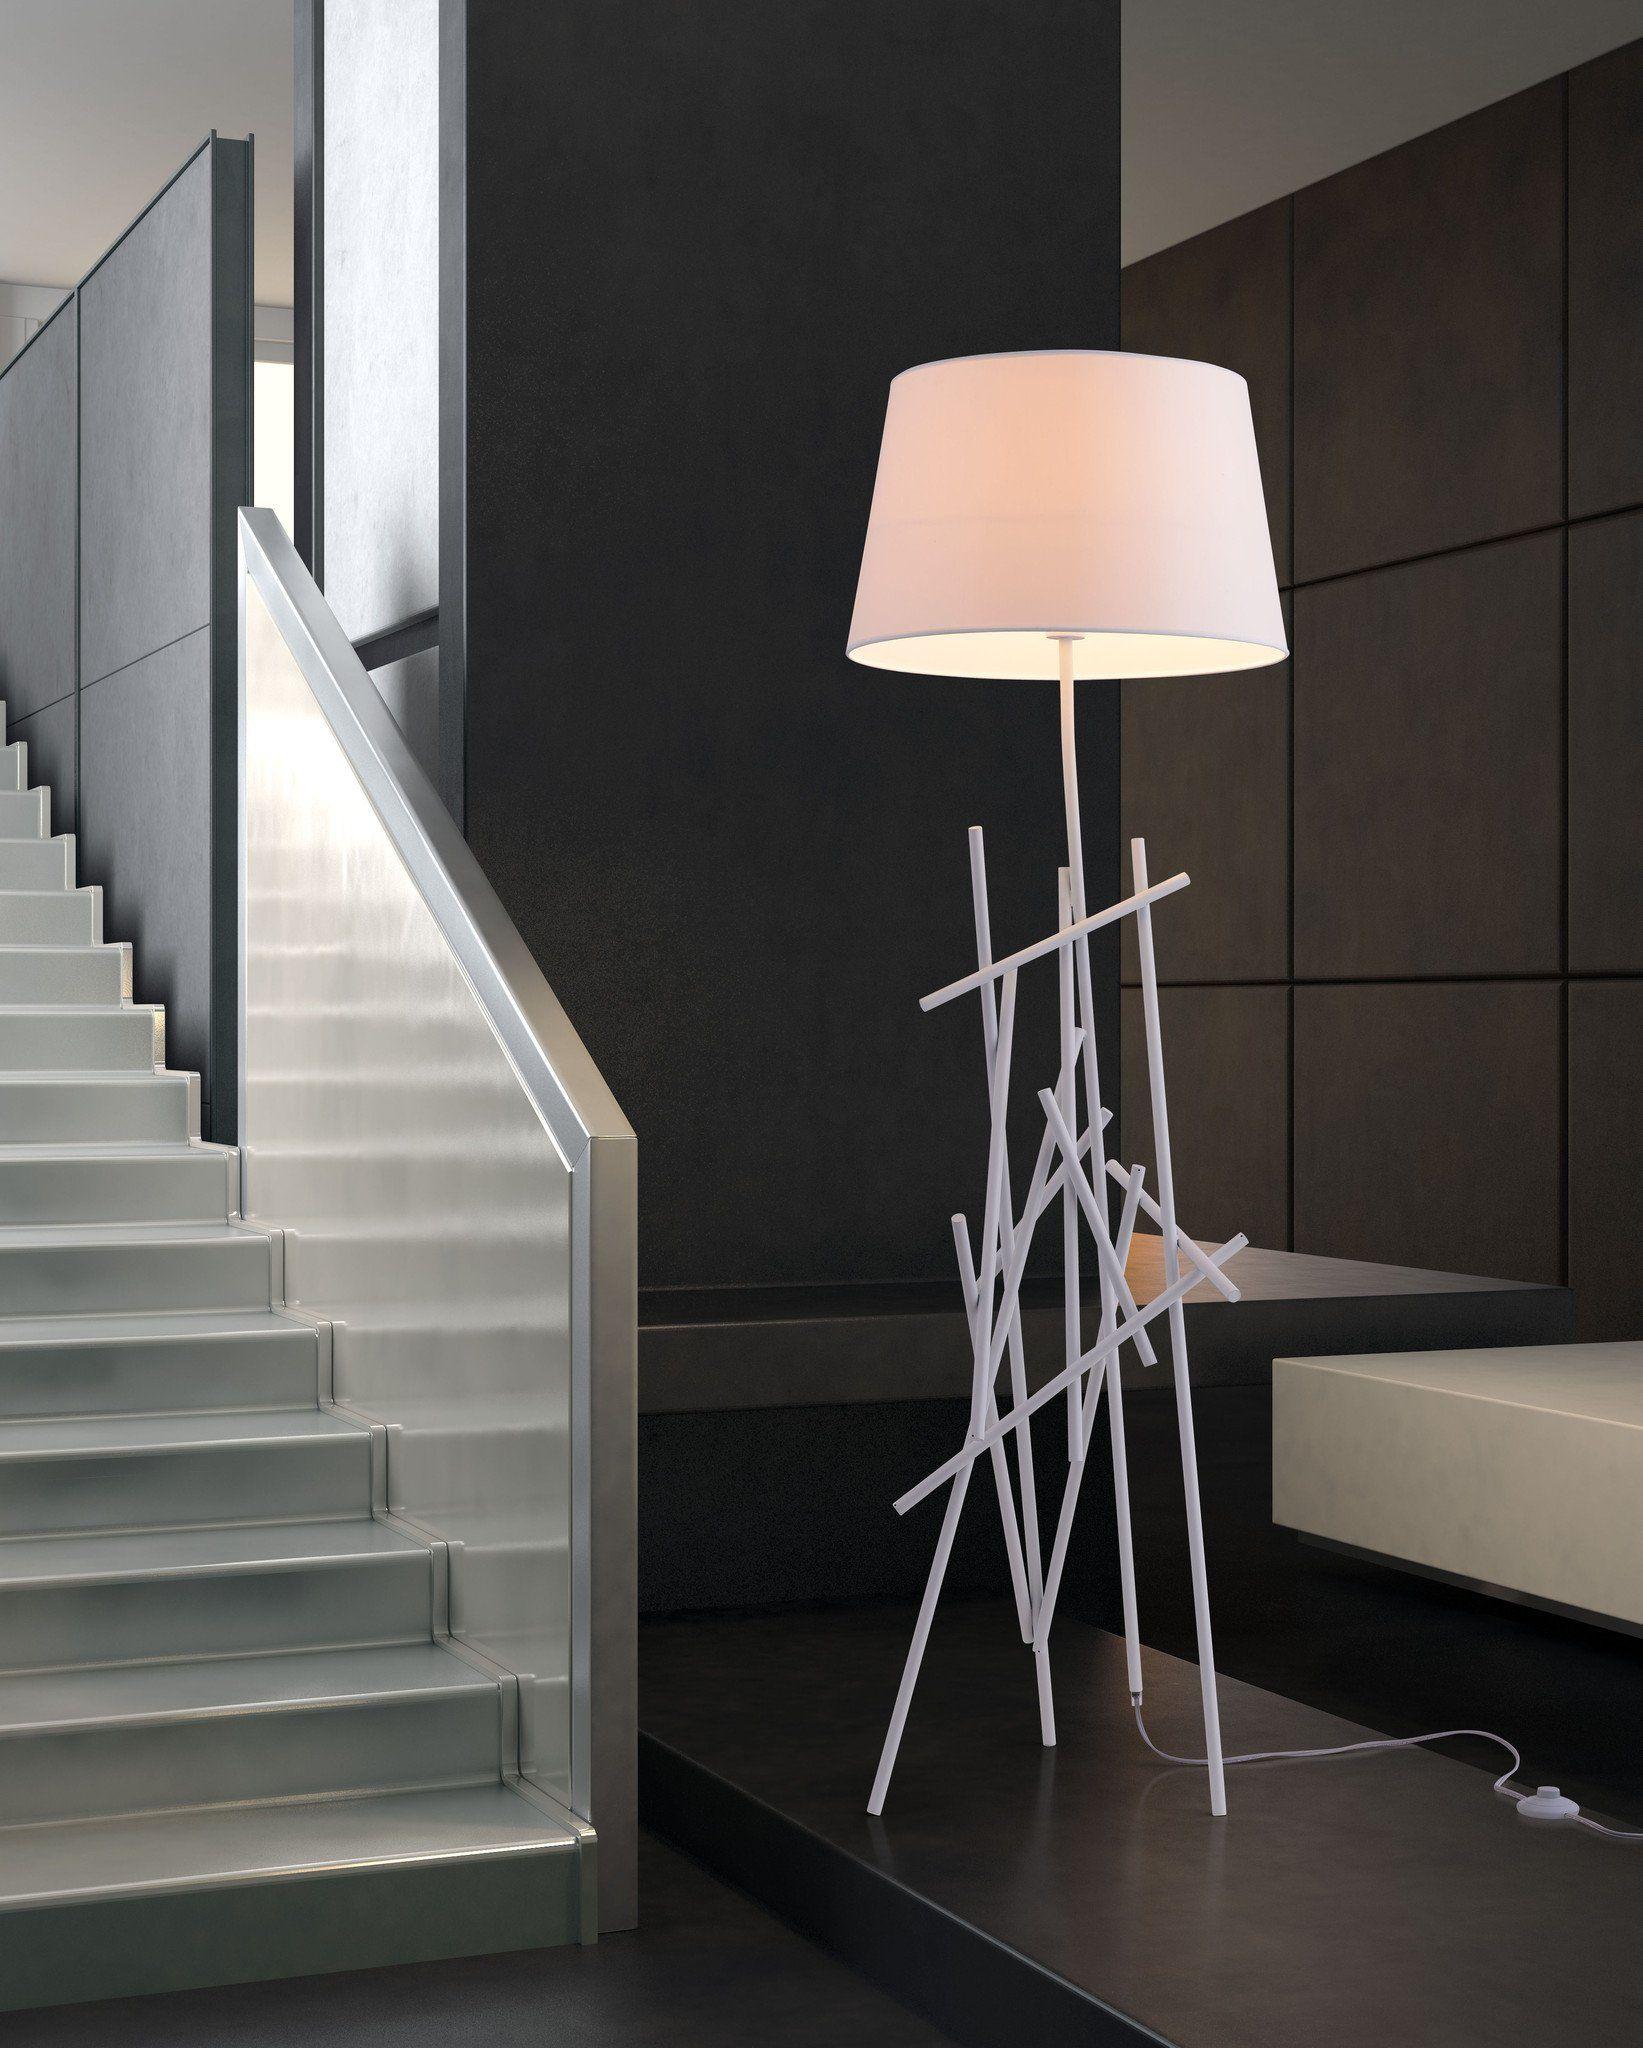 Delta Floor Lamp White In 2021 Modern Contemporary Floor Lamp White Floor Lamp Modern Floor Lamps